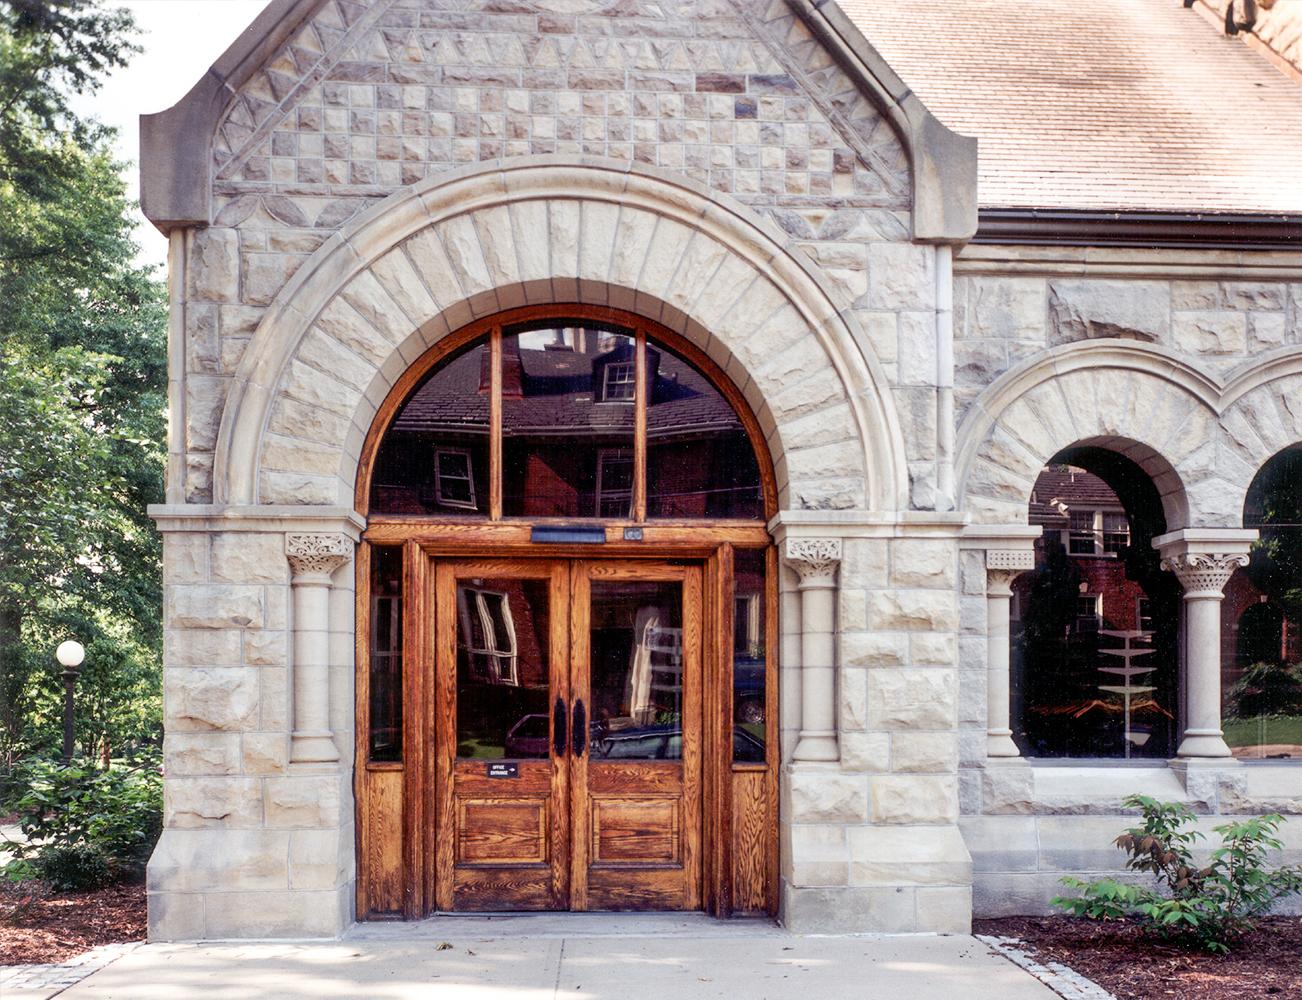 SHADYSIDE PRESBYTERIAN CHURCH